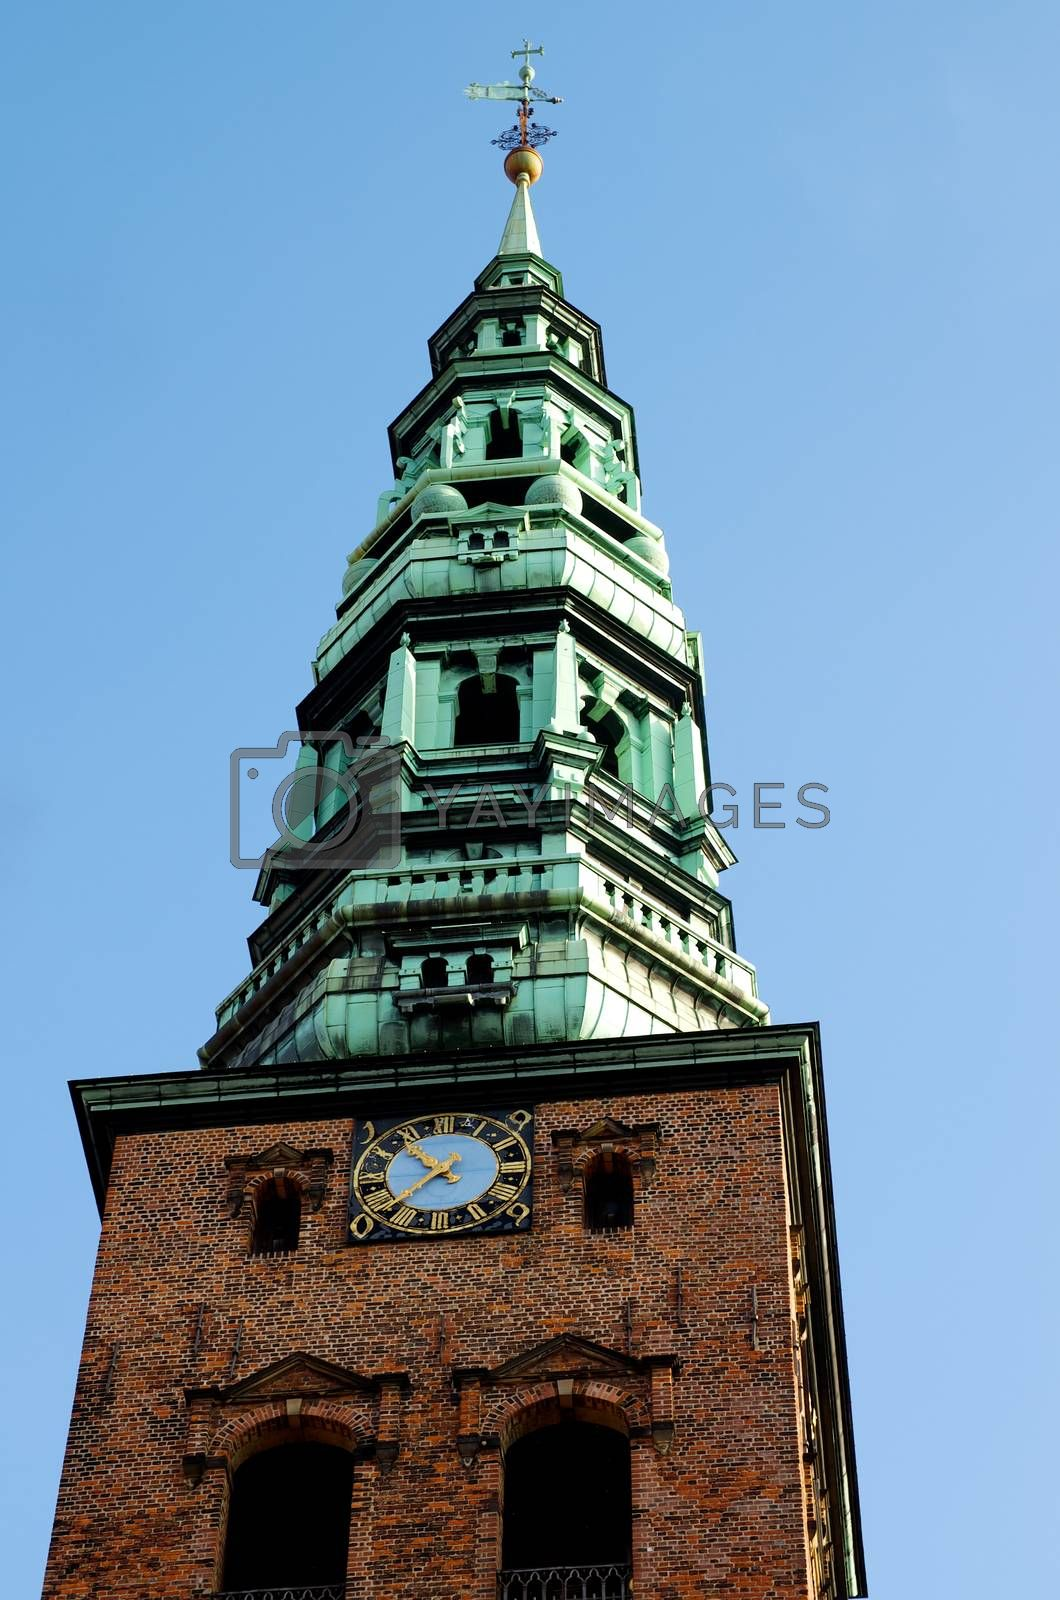 Spire of St. Nicholas Church against Blue Sky Outdoors Bottom View. Copenhagen, Denmark